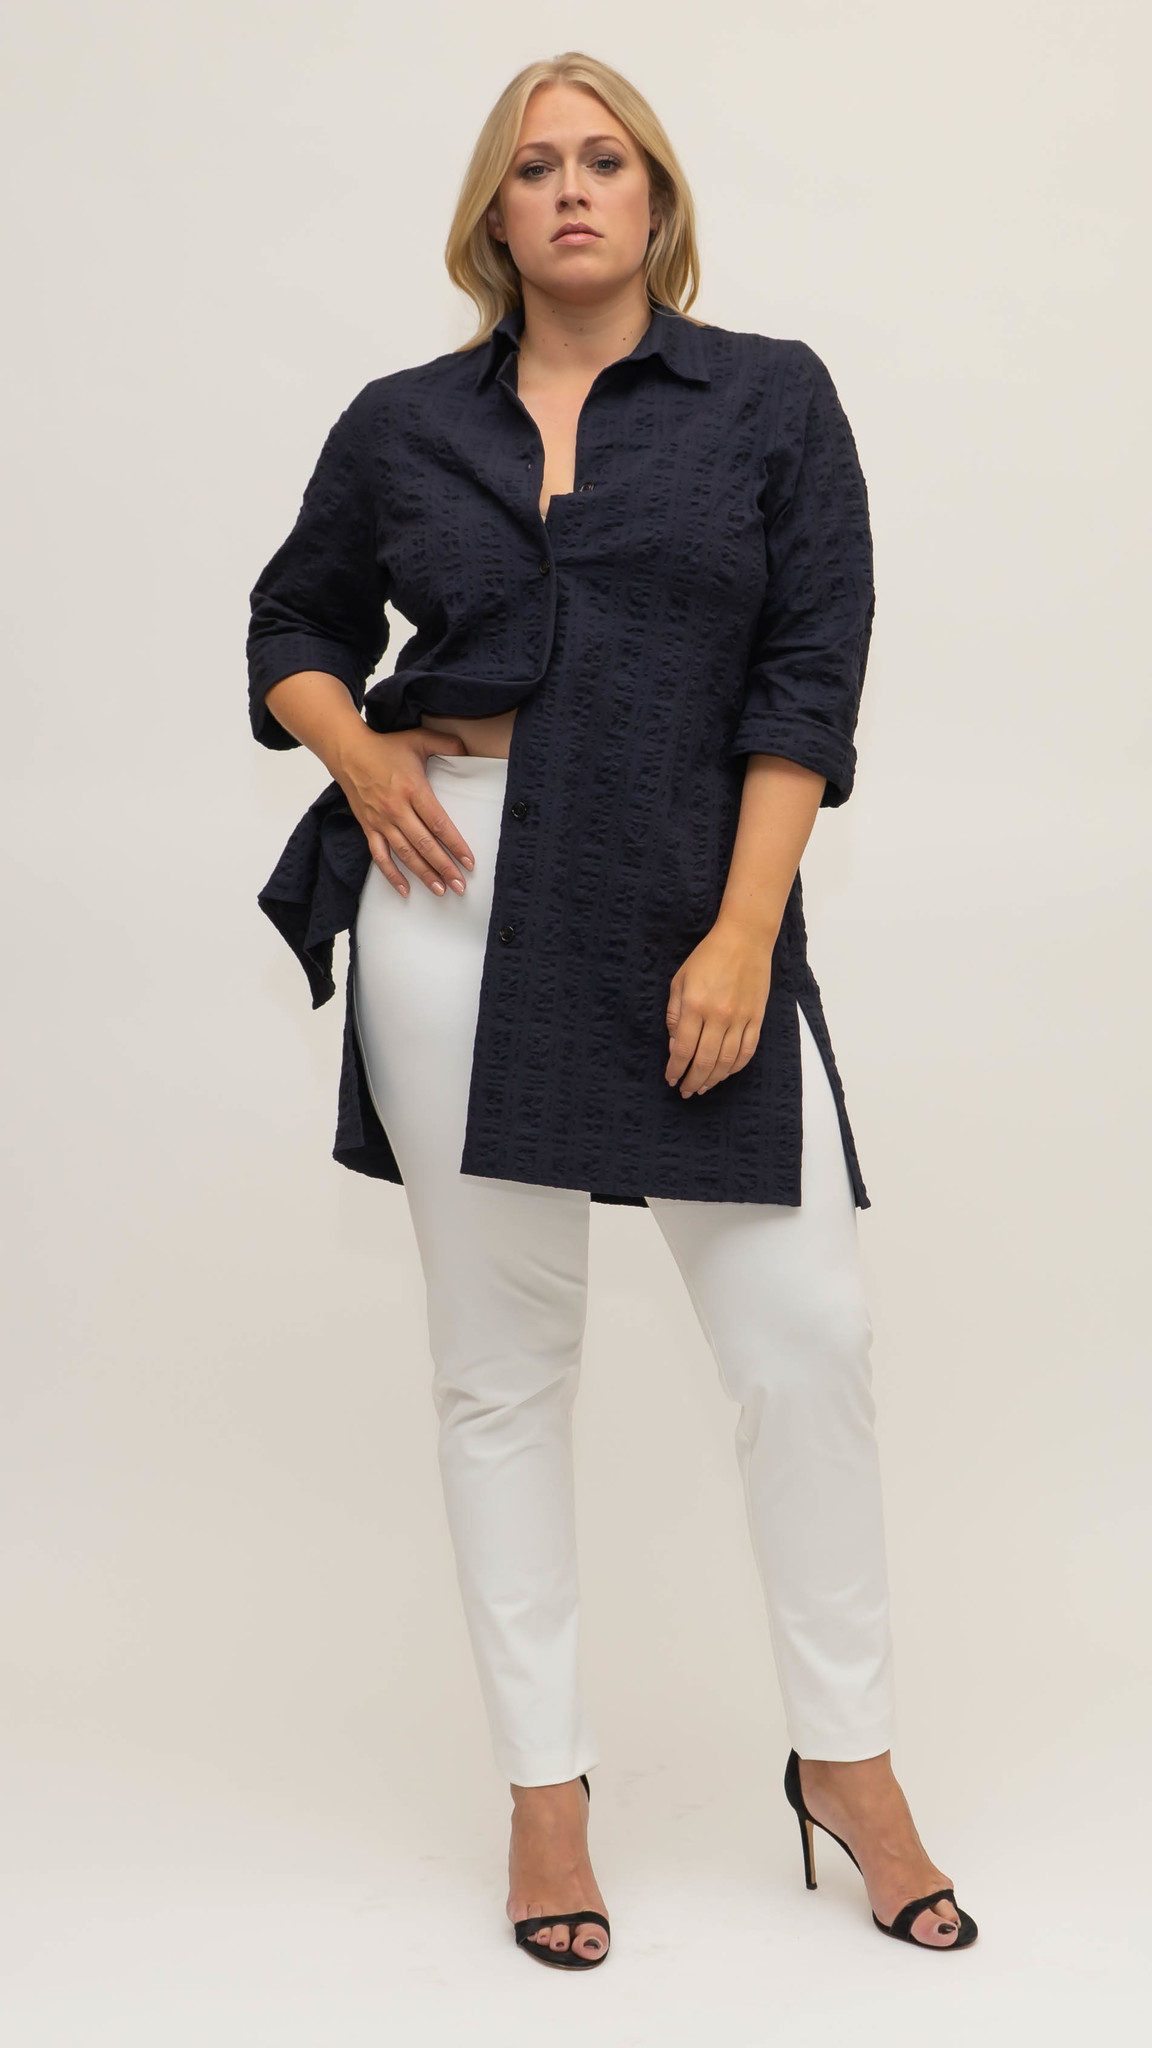 BETTINA Blouse in Cotton Seersucker-2